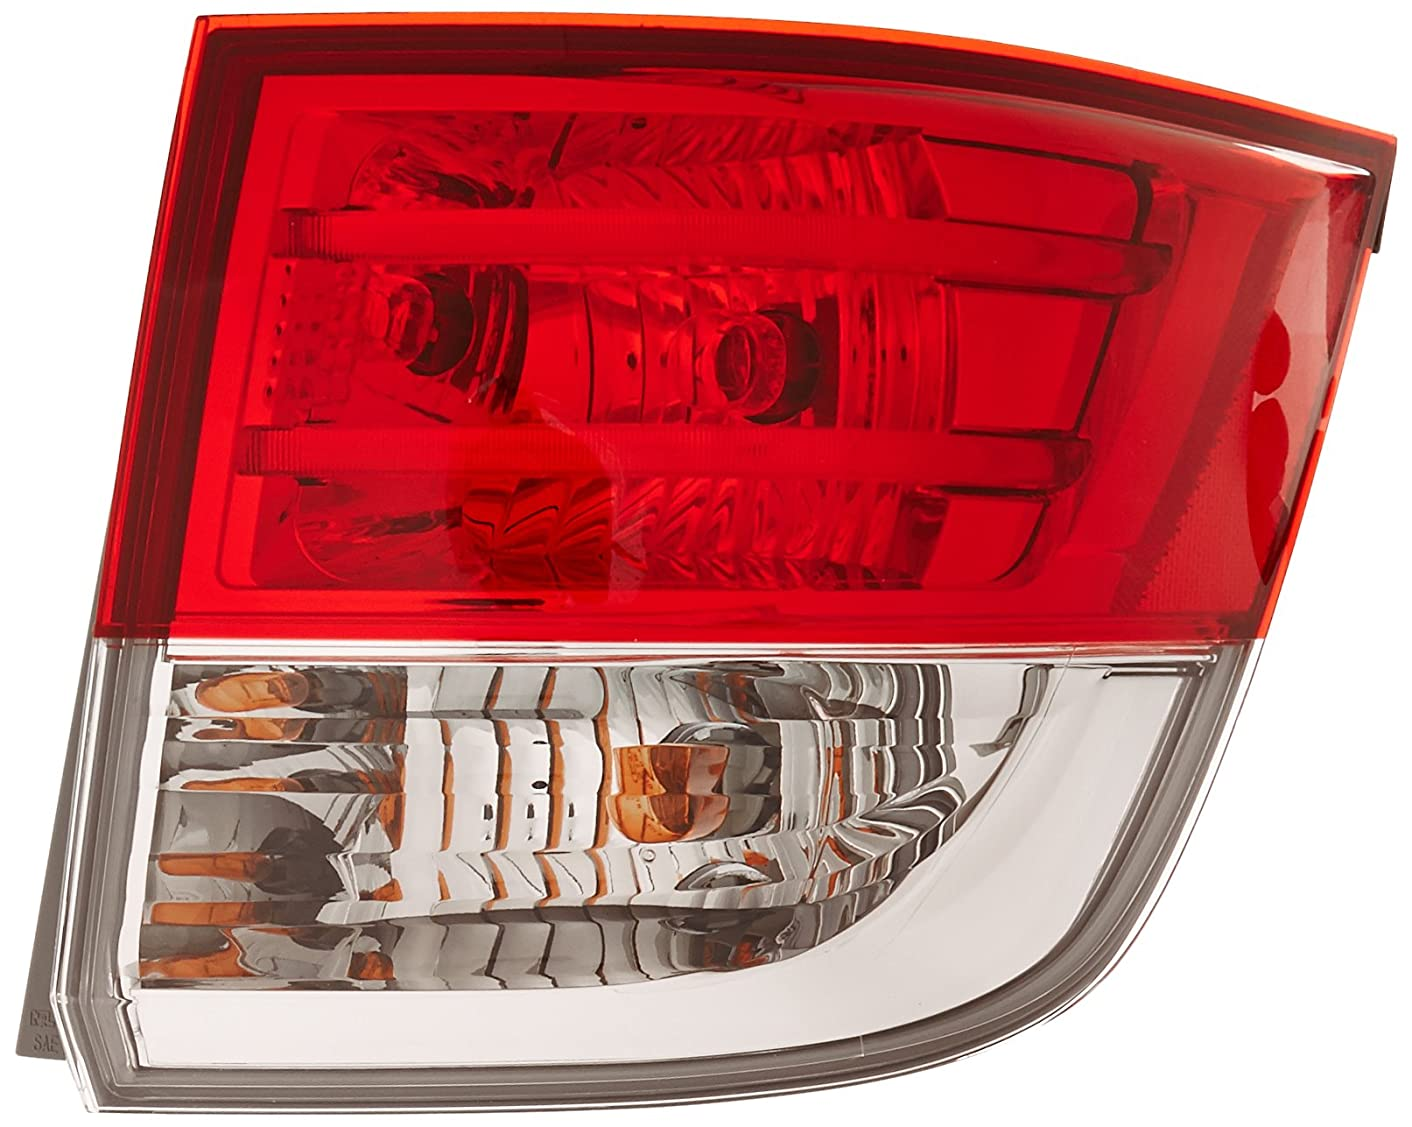 Genuine Honda 33500-TK8-A11 Taillight Assembly